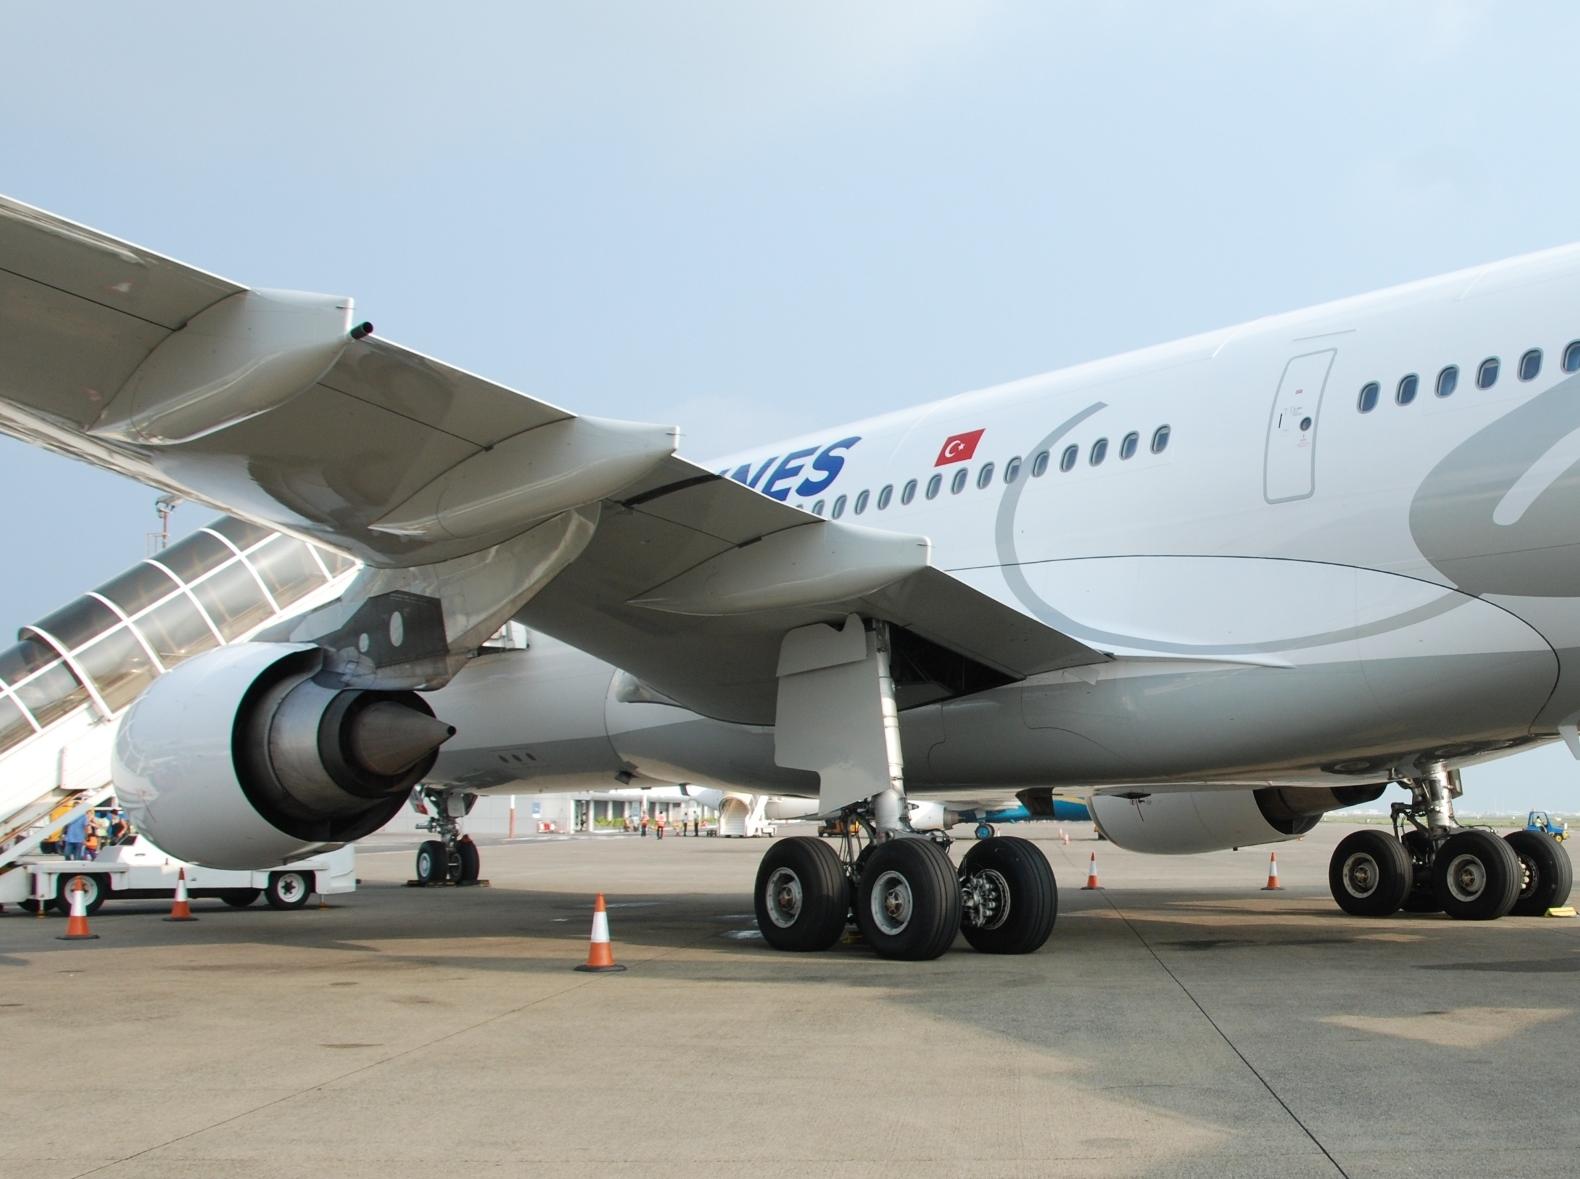 THY_Turkish-Airlines_Airbus-A330_TC-JNA_Maldives_Dec-2012_crop